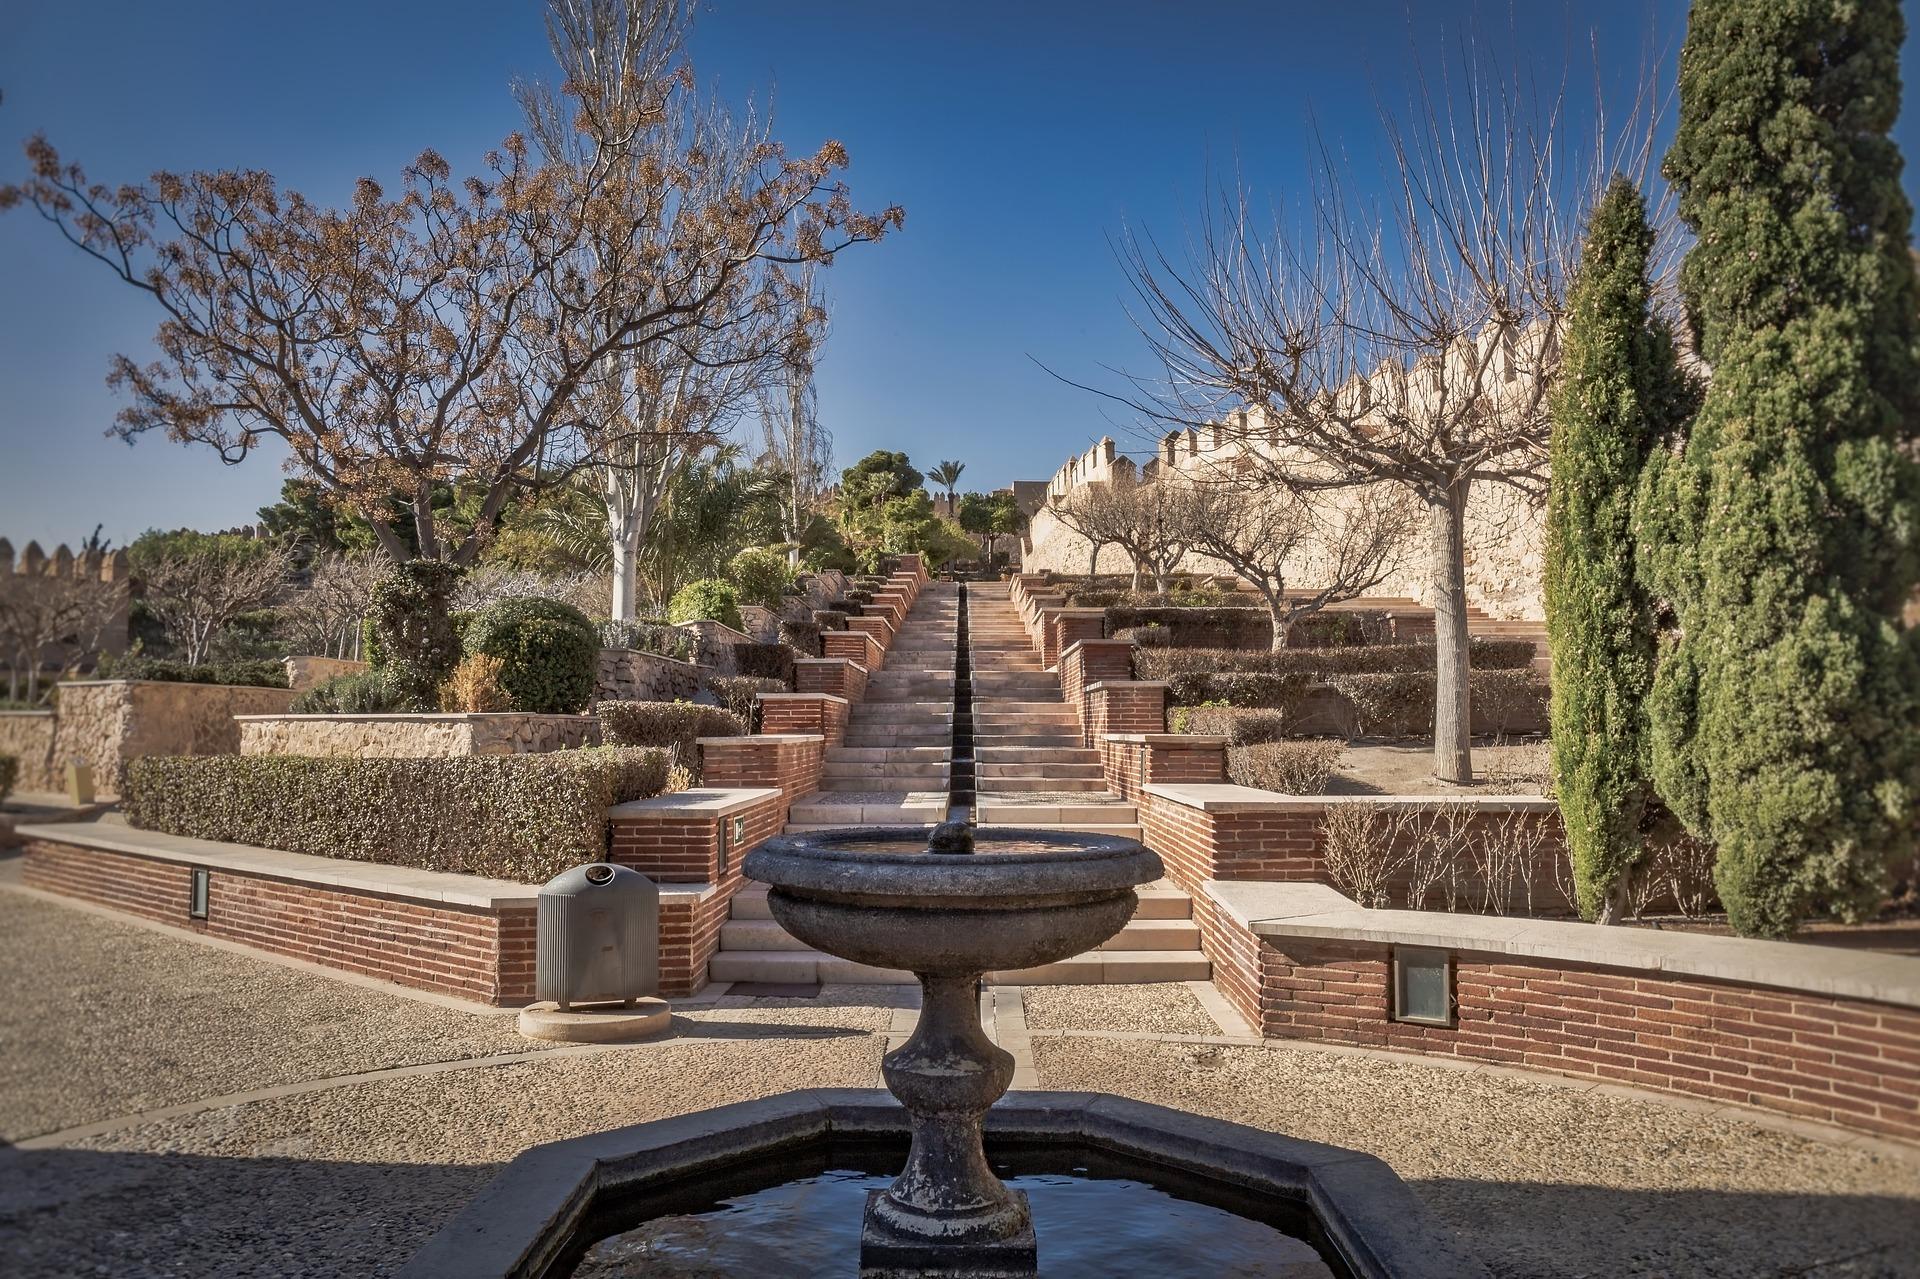 alcazaba-historic-fortress-water-feature-garden-almeria--pixabay-4021553_1920.jpg